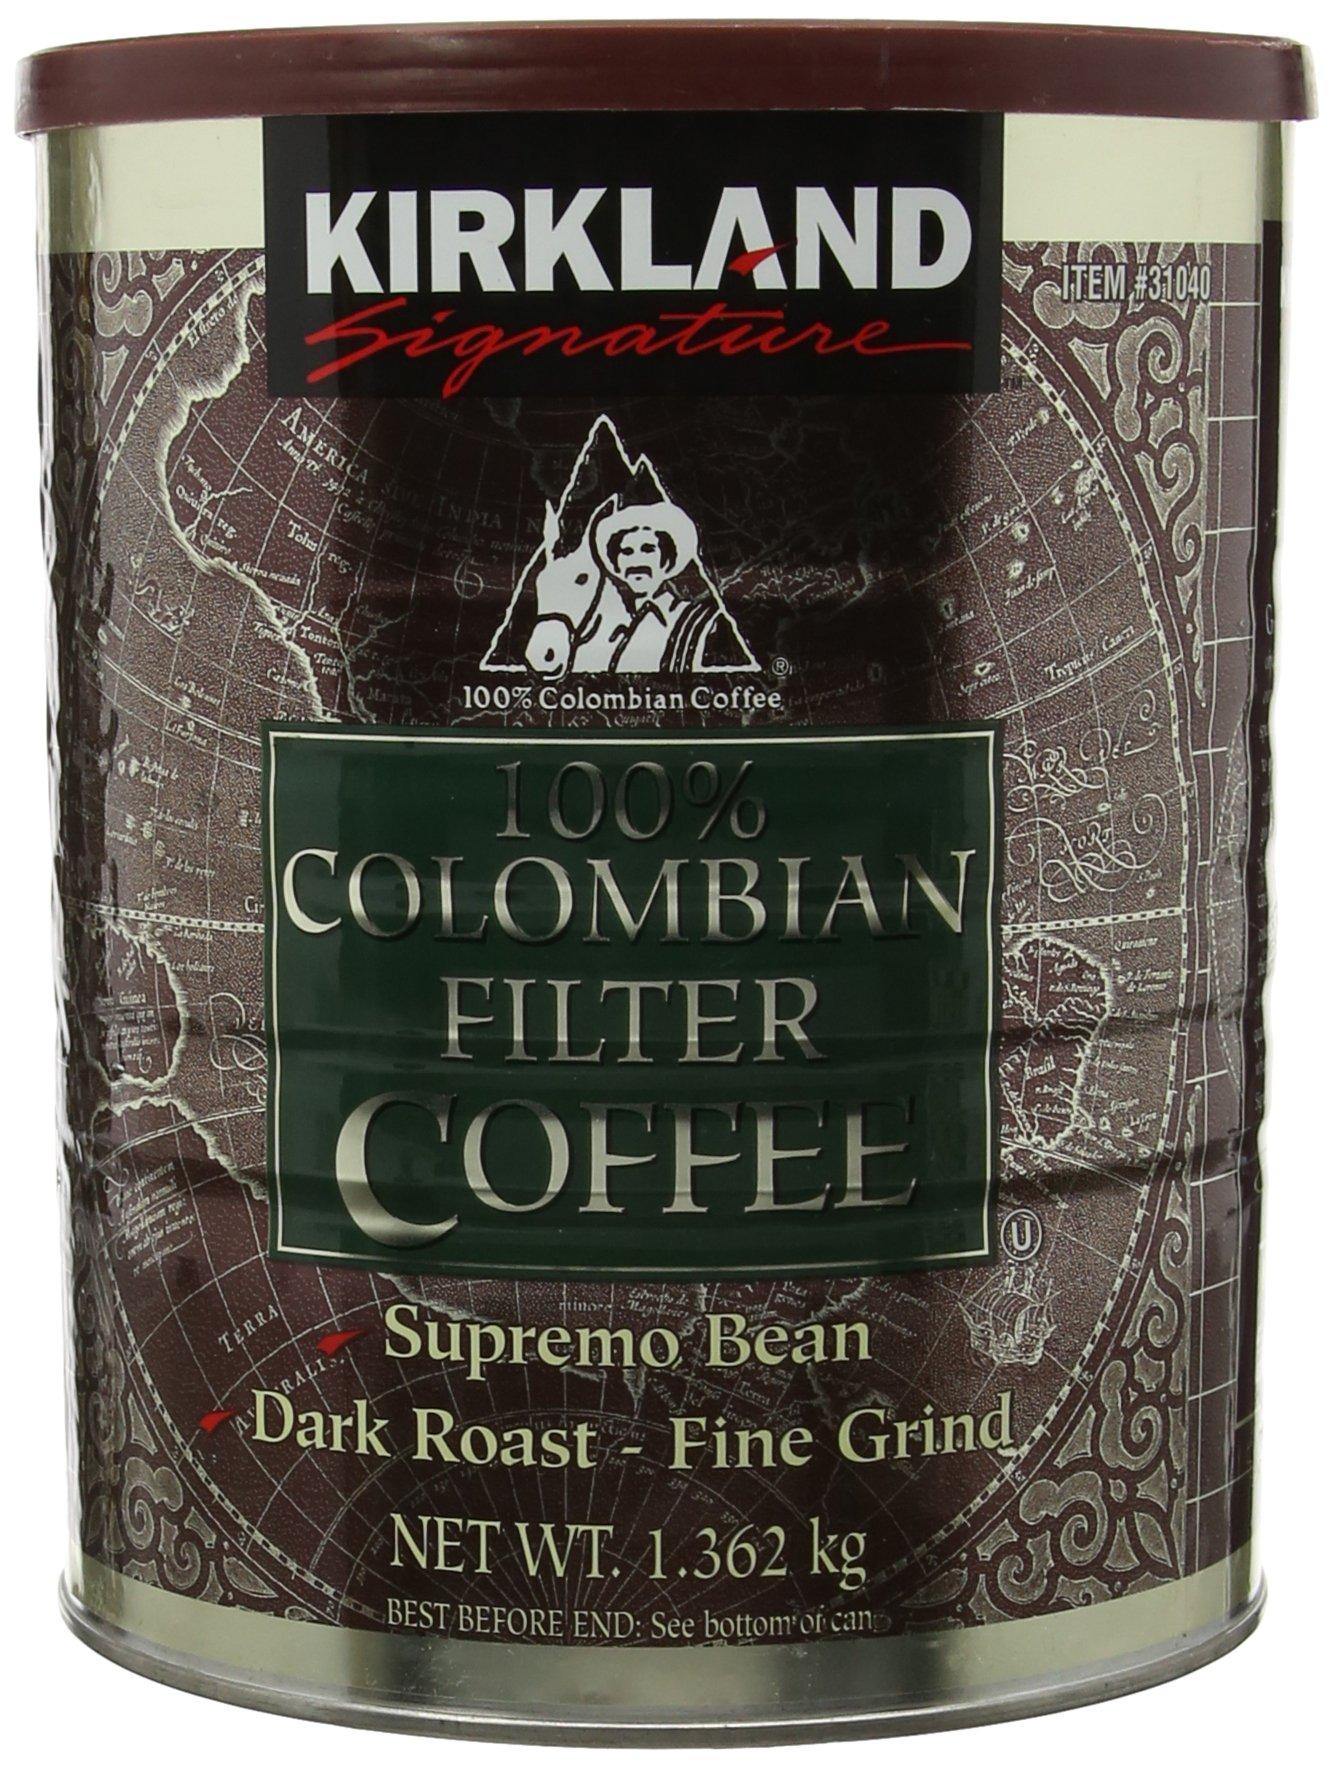 Kirkland-Signature-100-Colombian-Filter-Coffee-Supremo-Bean-Dark-Roast-Fine-Grind-136kg